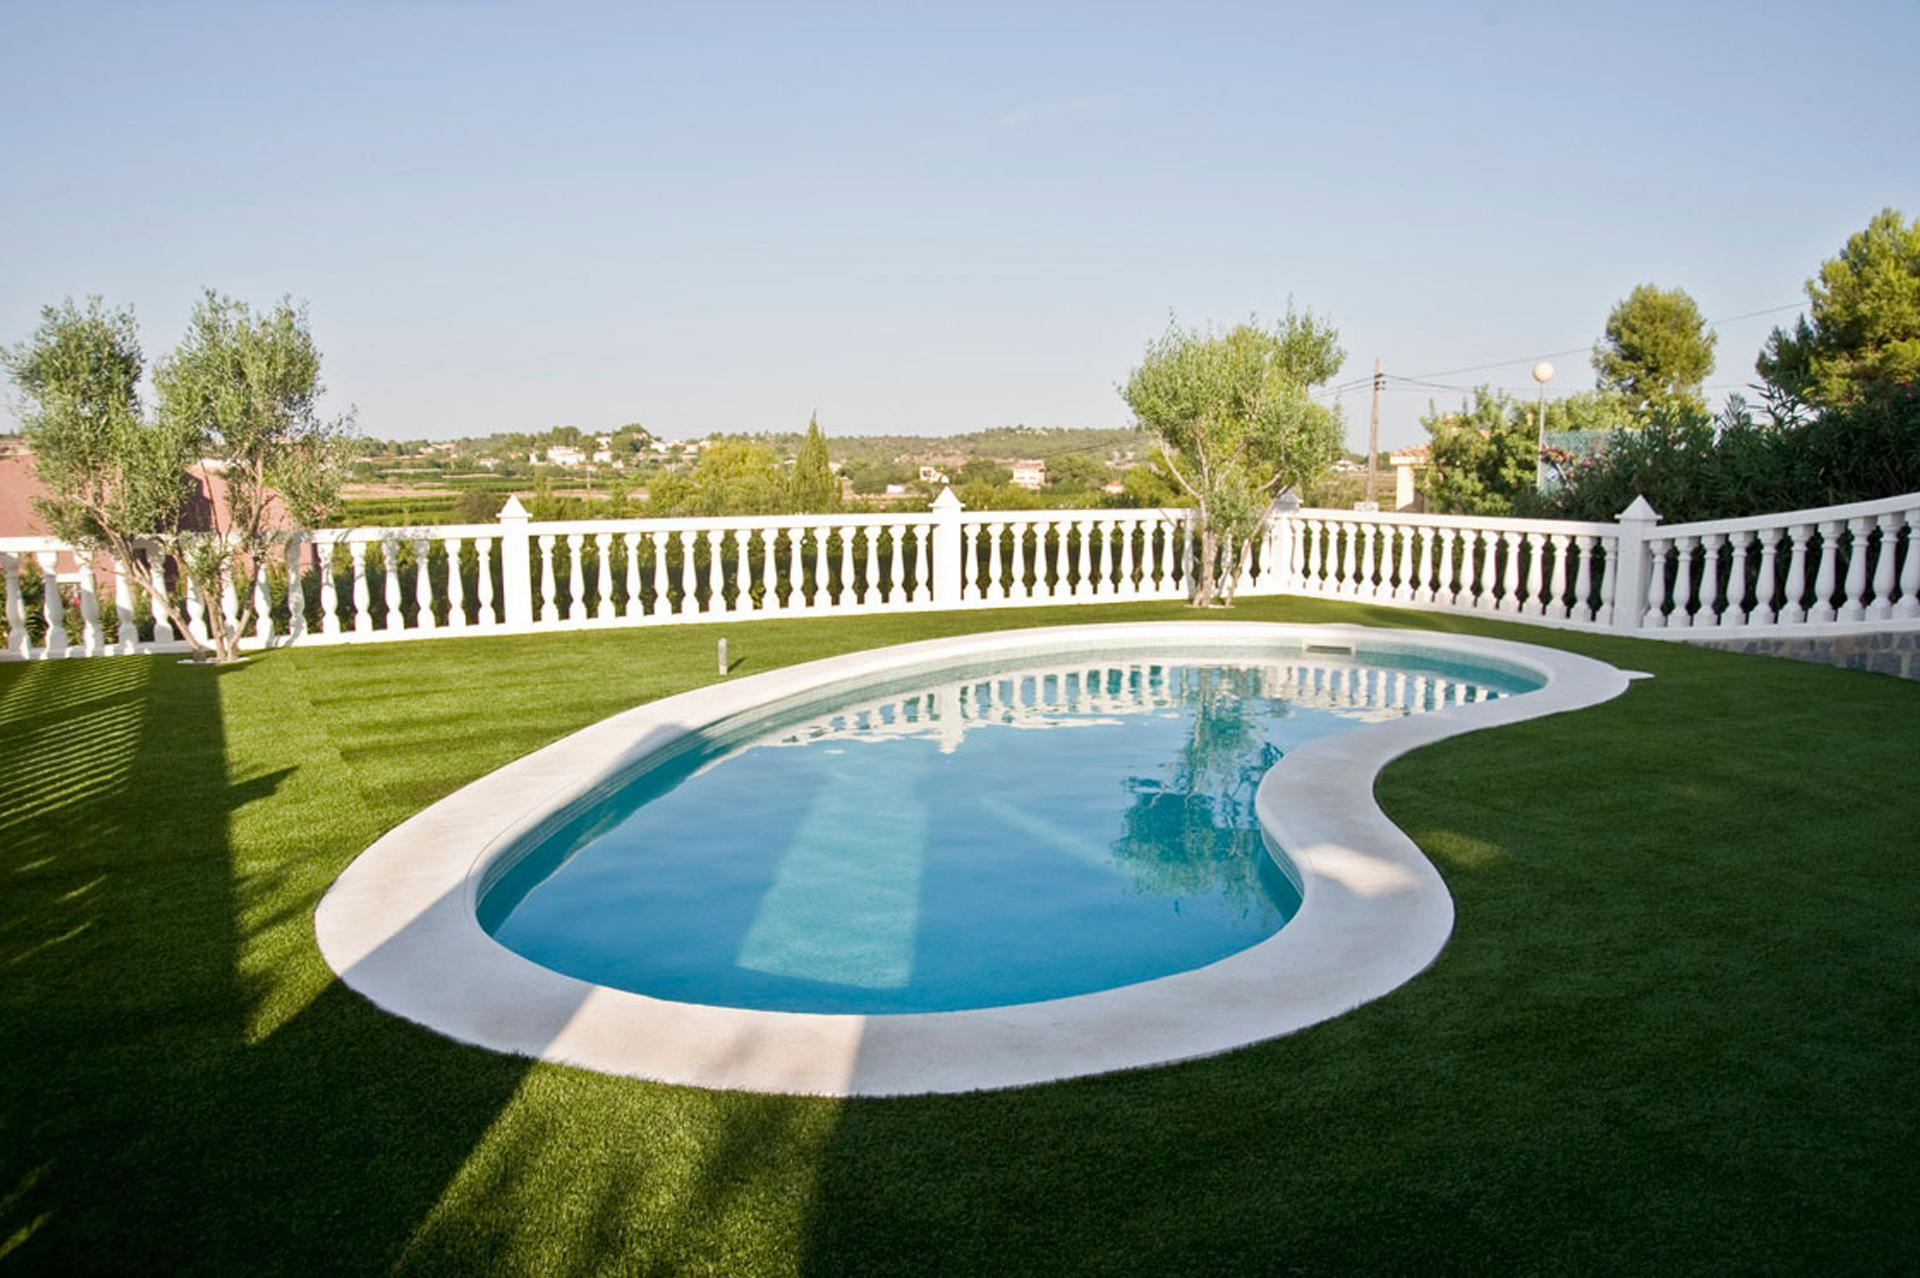 piscina_montserrat_poolplay_5